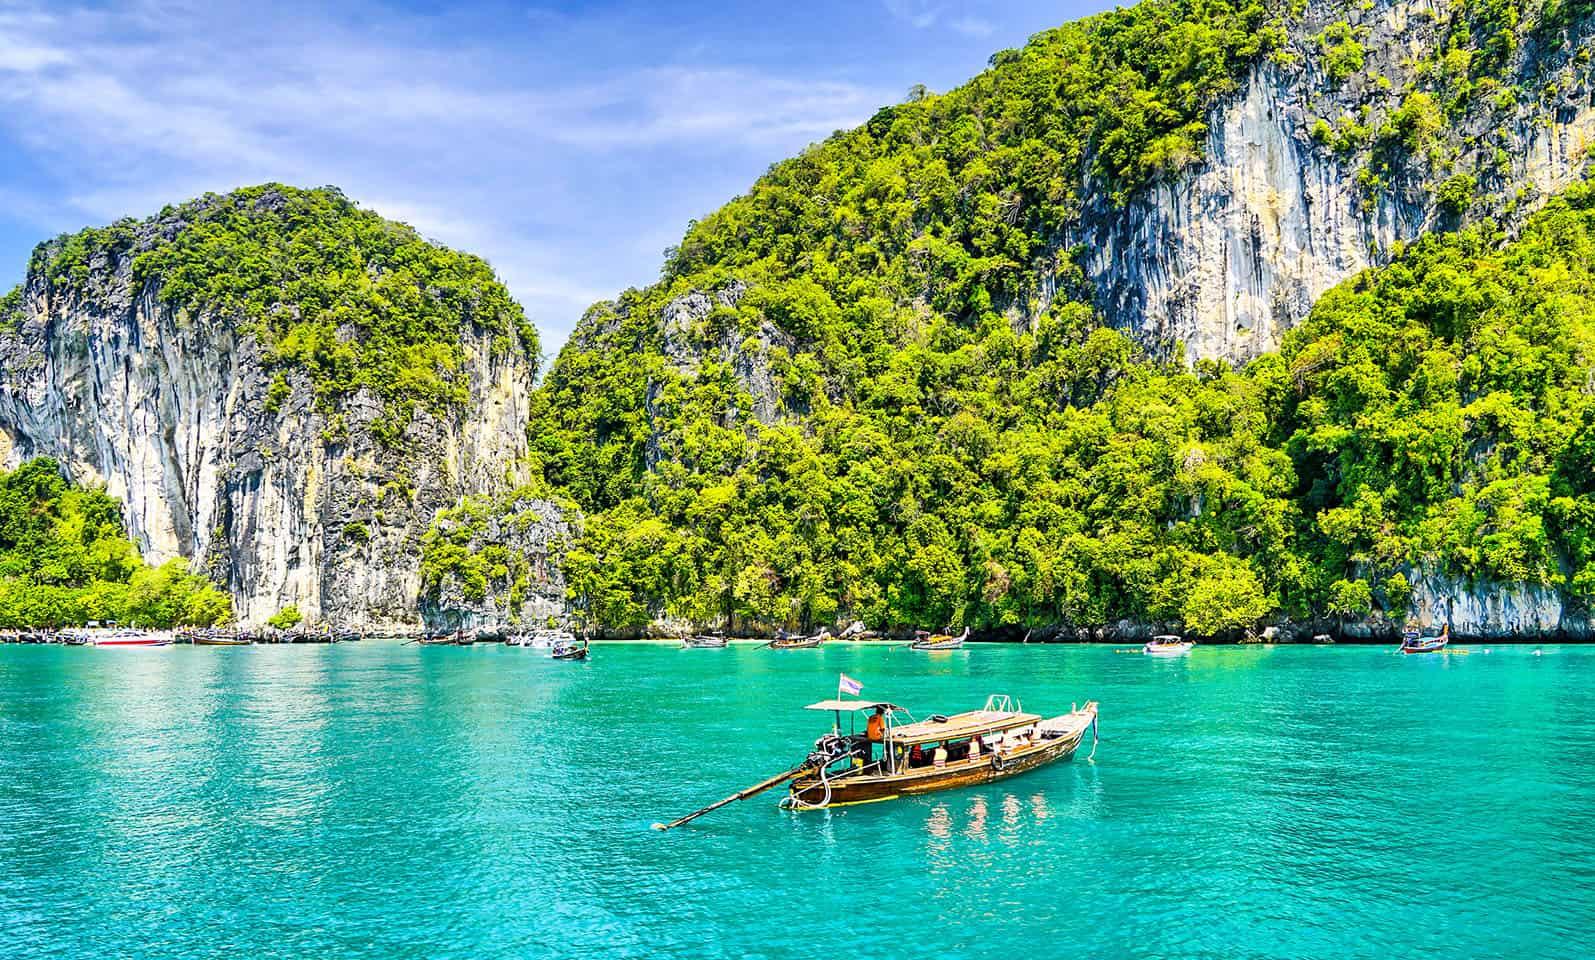 travel-guide-to-asia-viva-glam-magazine-main-image